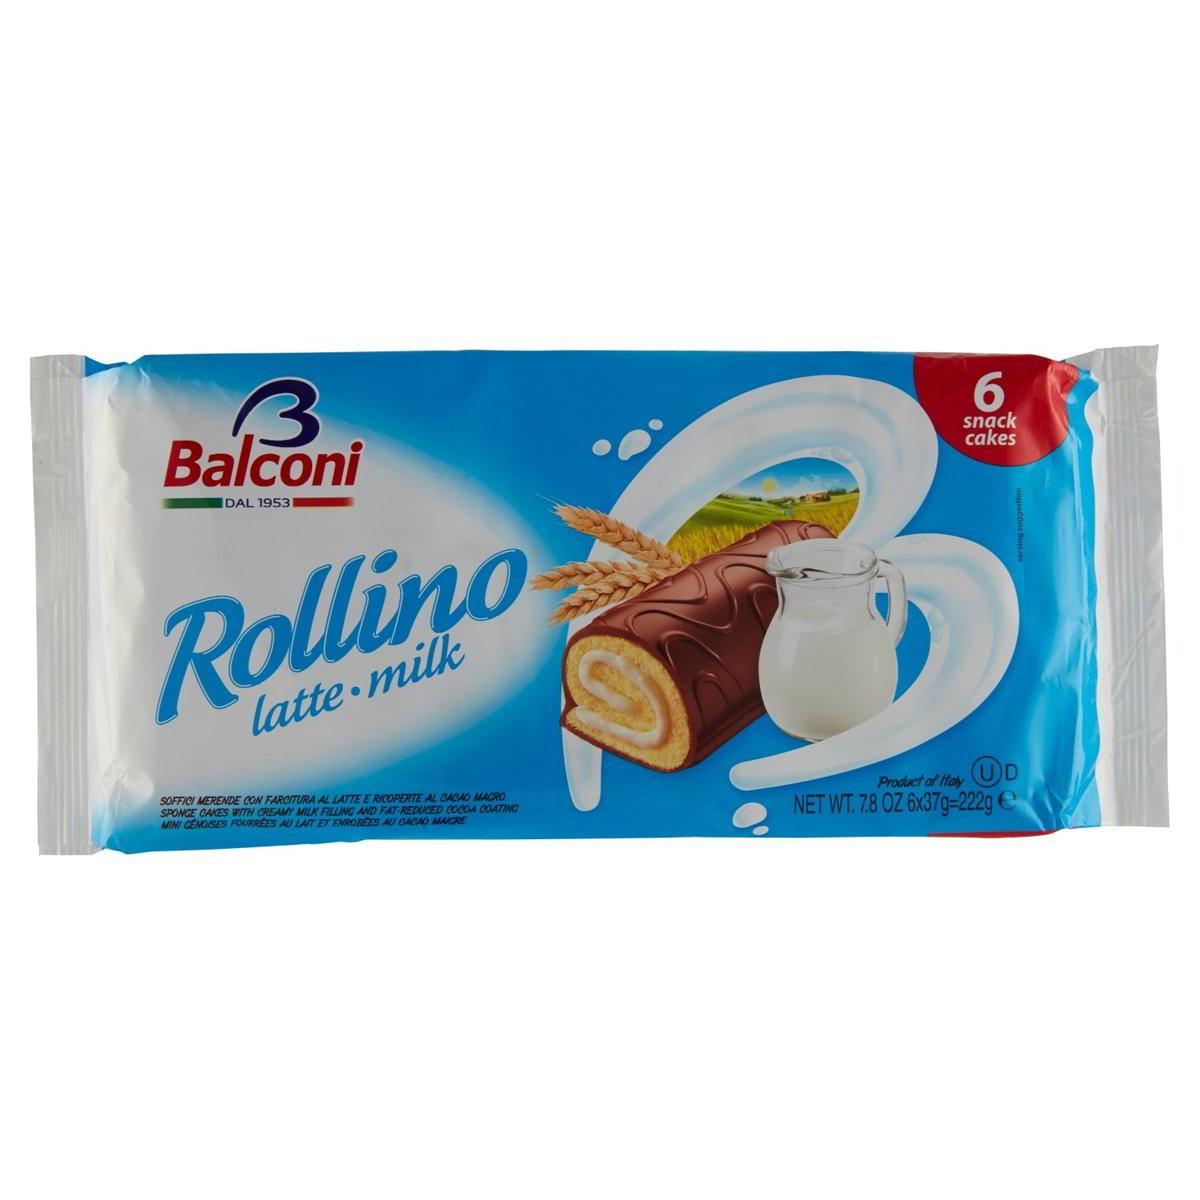 Rollino